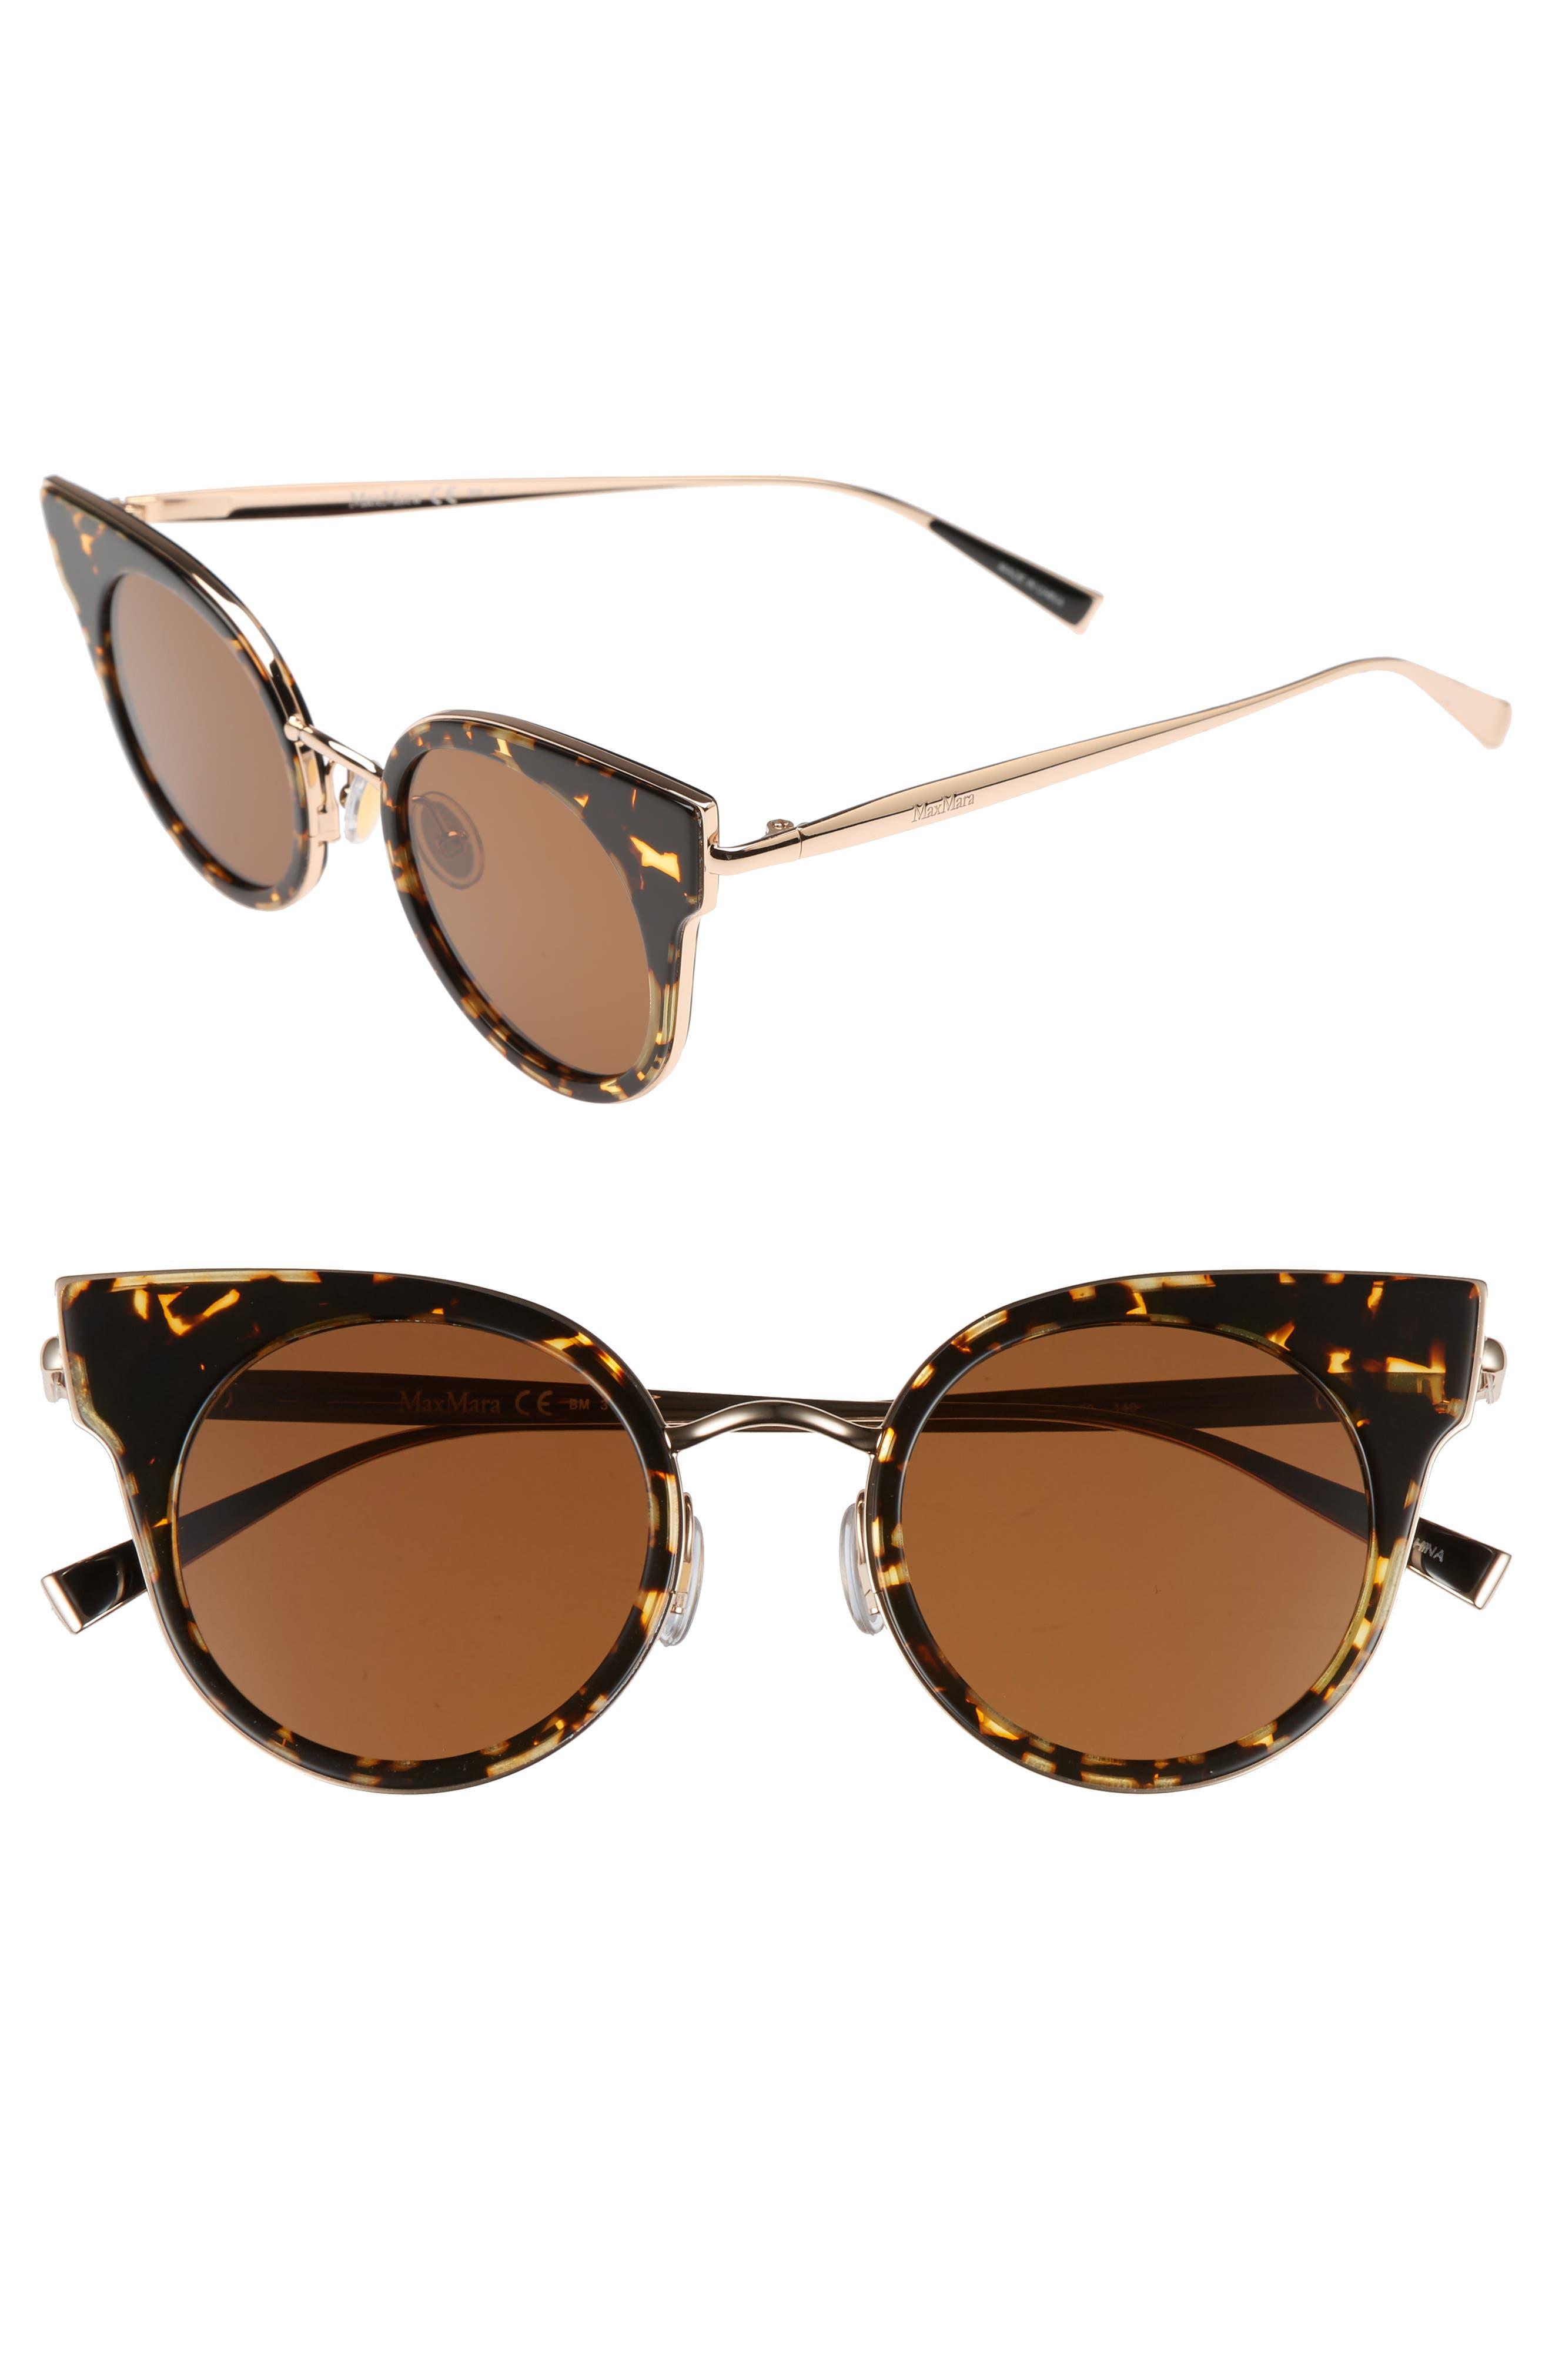 Alternate Image 1 Selected - Max Mara Ilde 46mm Cat Eye Sunglasses